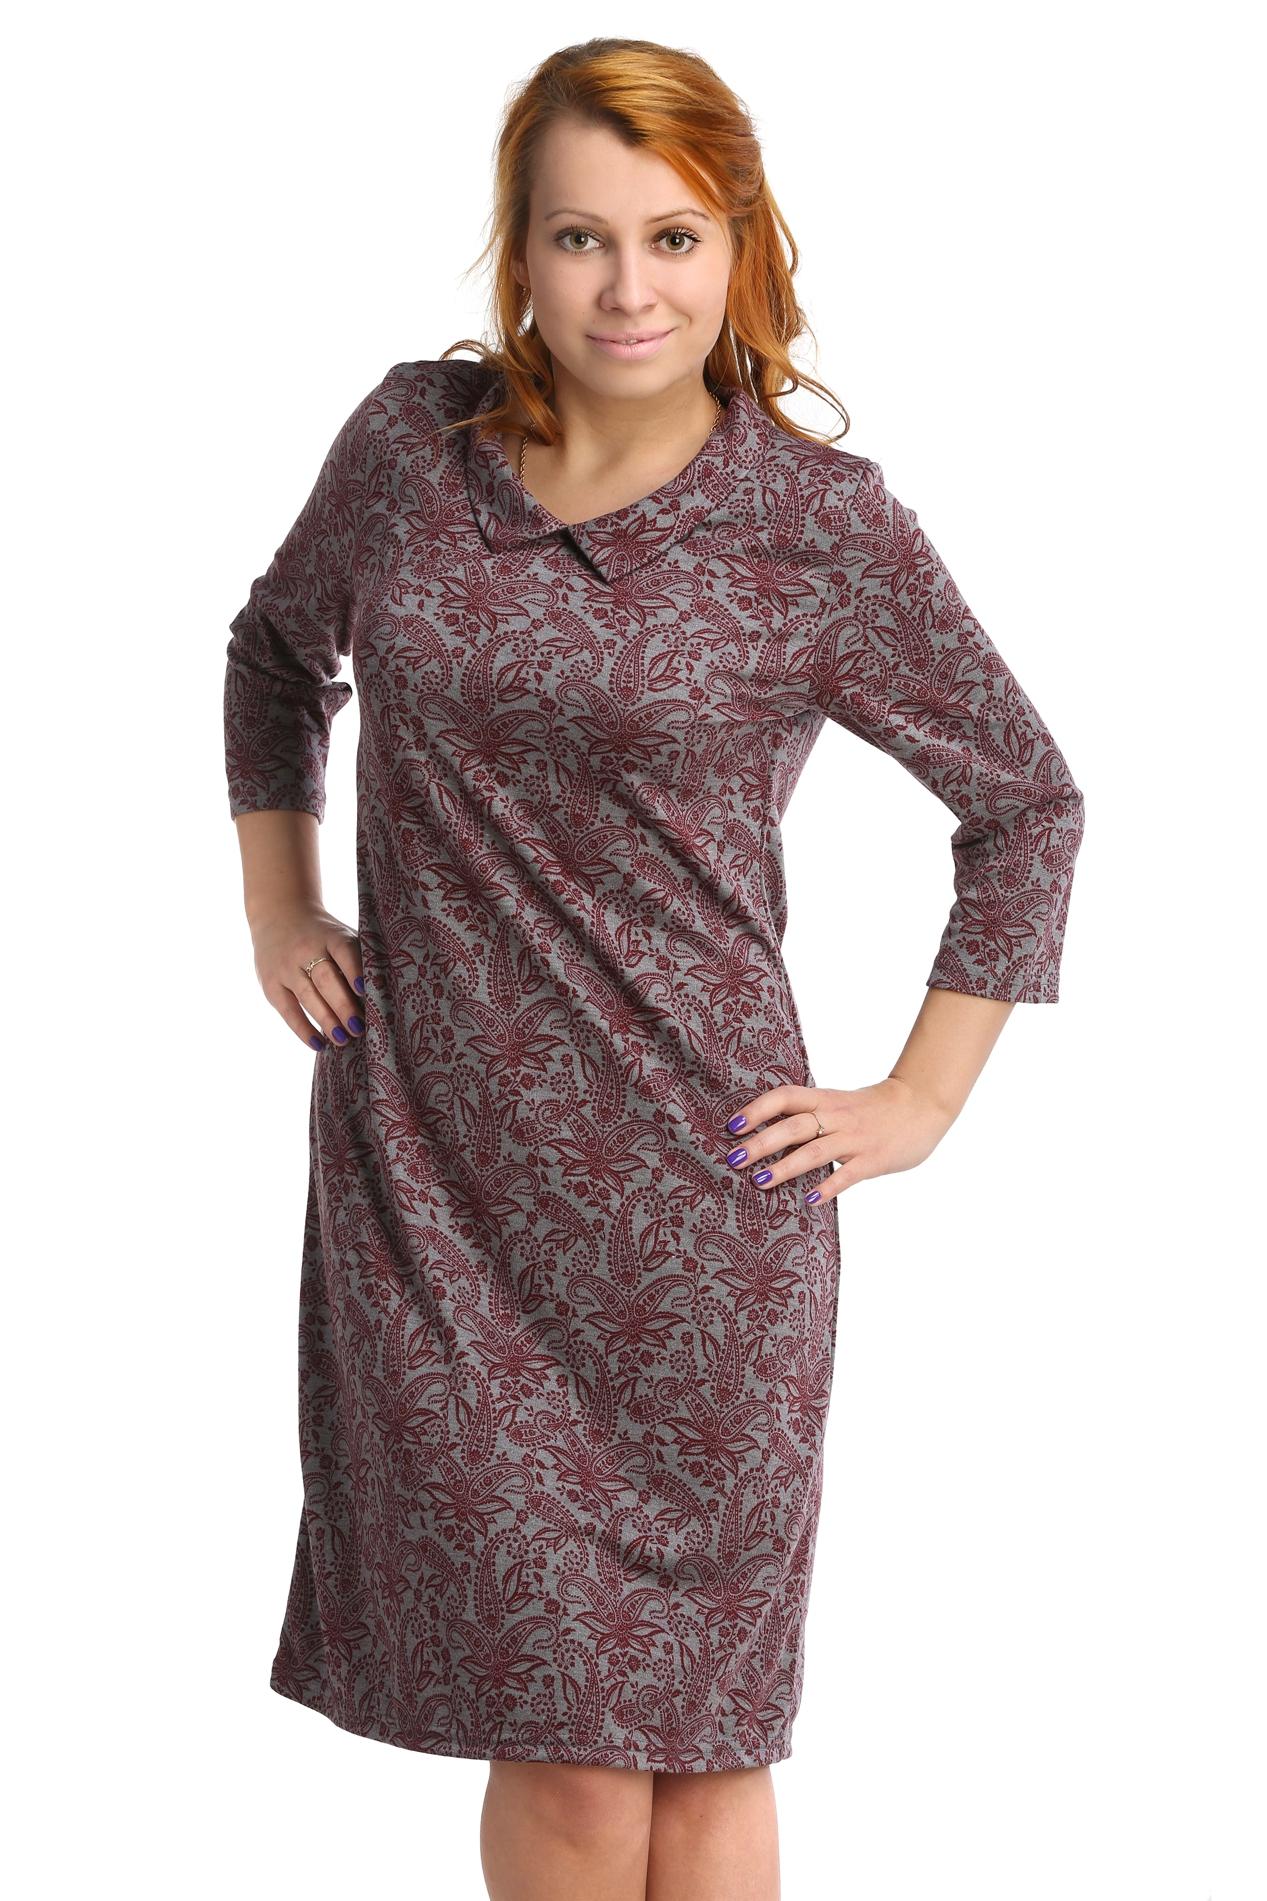 Жен. платье арт. 16-0073 Бордо р. 48Распродажа<br>Обхват груди: 96 см <br>Обхват талии: 77 см <br>Обхват бедер: 104 см <br>Длина по спинке: 99 см <br>Рост: 164-170 см<br><br>Тип: Жен. платье<br>Размер: 48<br>Материал: Интерлок